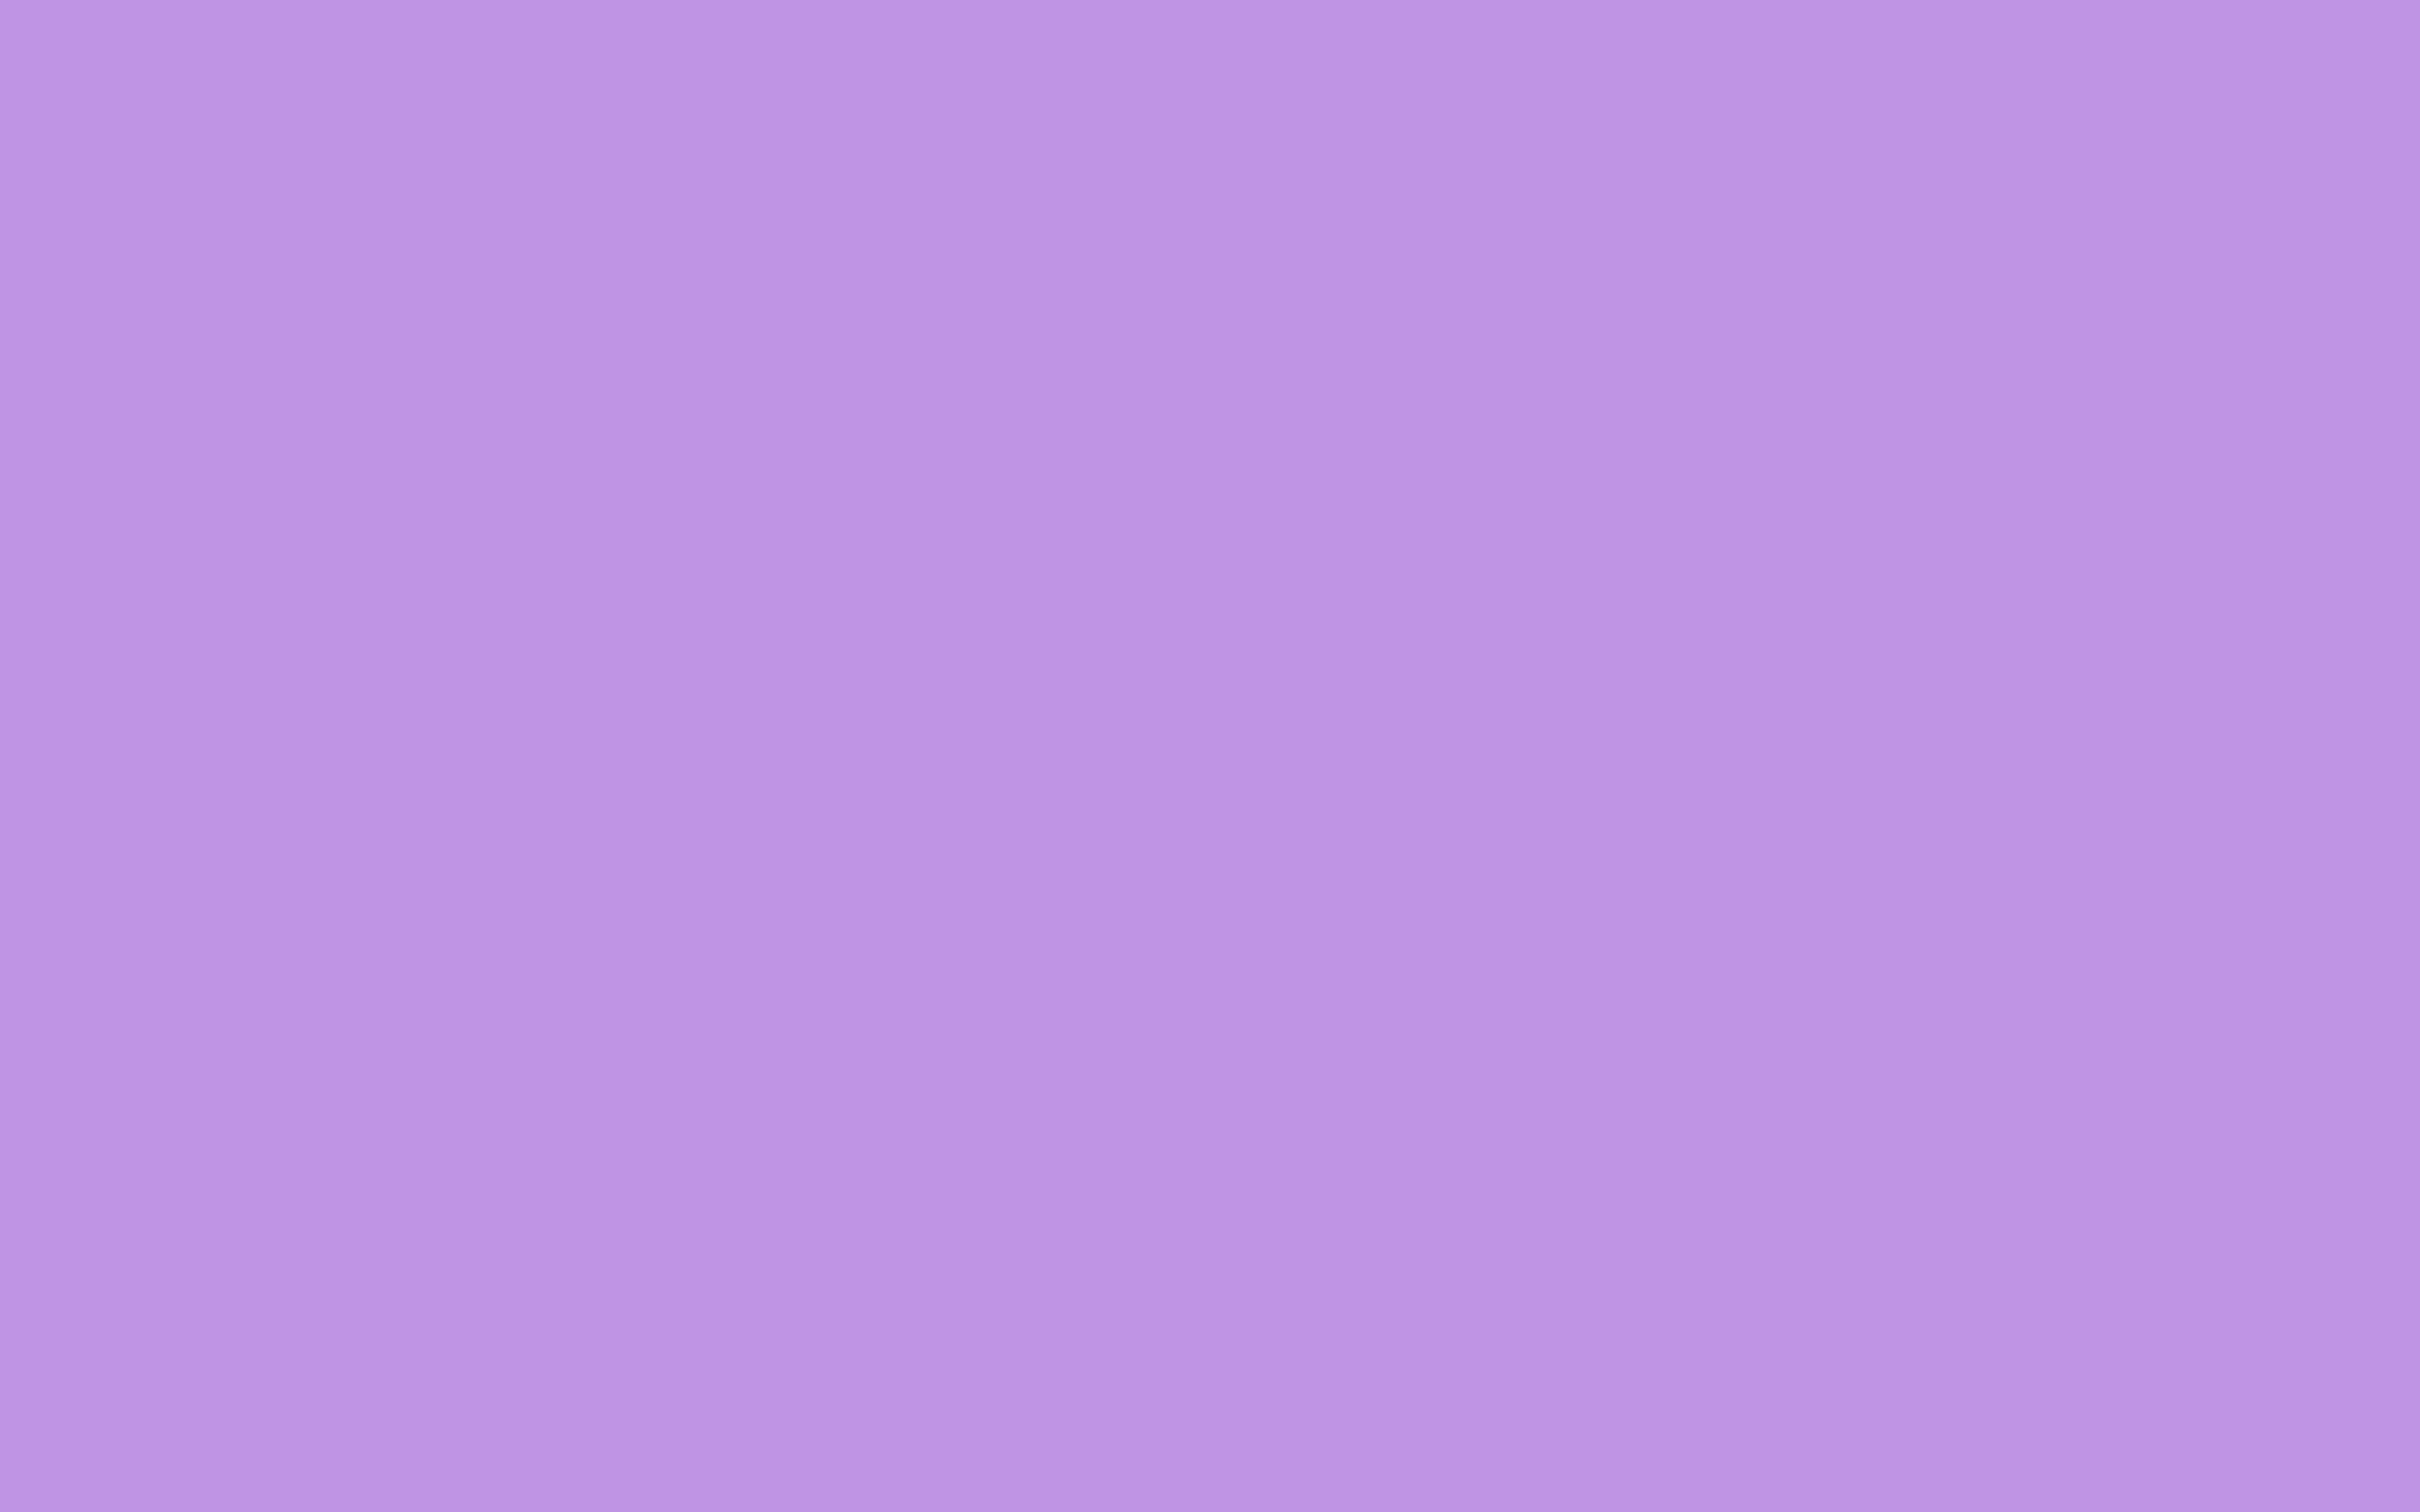 Light purple solid color wallpaper hd wallpapers.